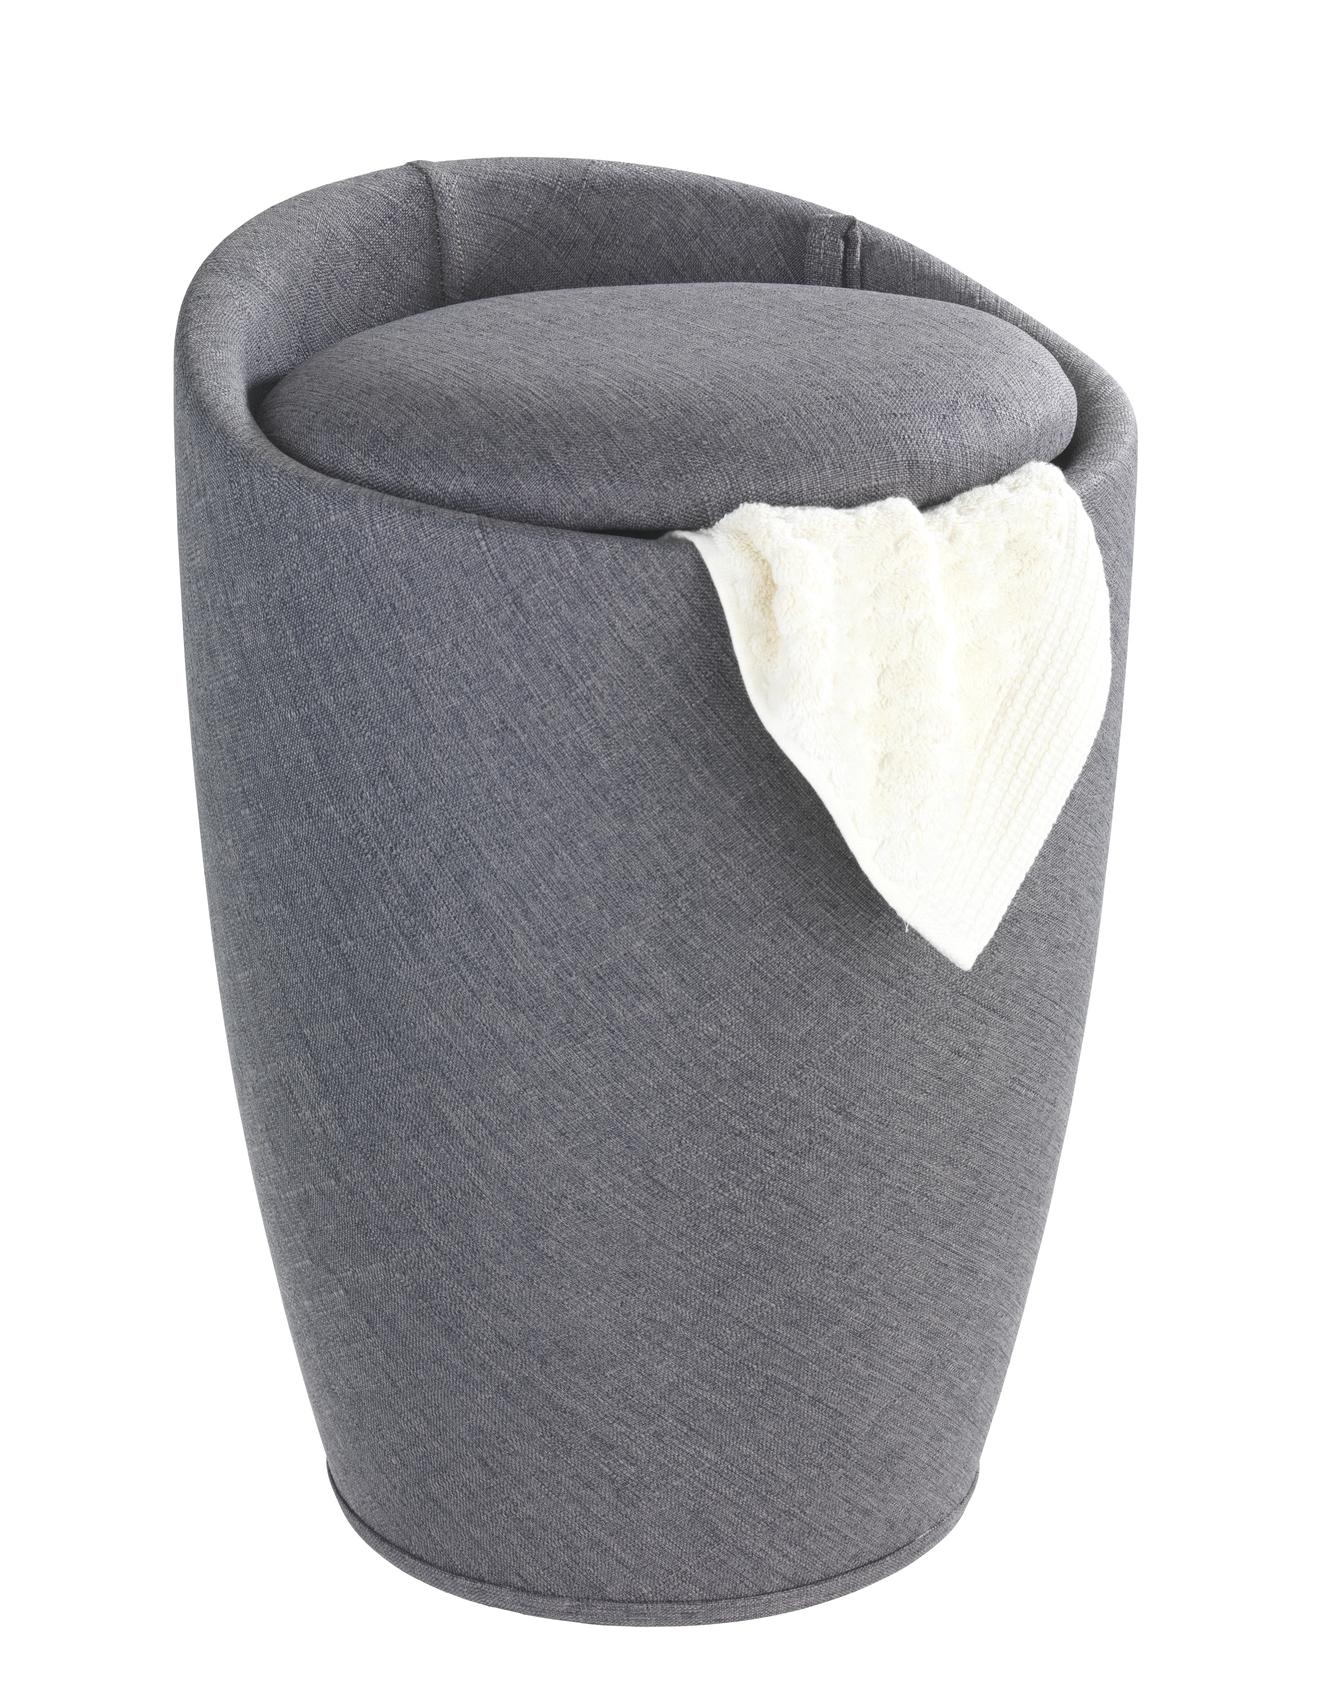 Cos de rufe / Taburet din plastic, tapitat cu stofa, Candy Gri Inchis, Ø36xH50,5 cm somproduct.ro